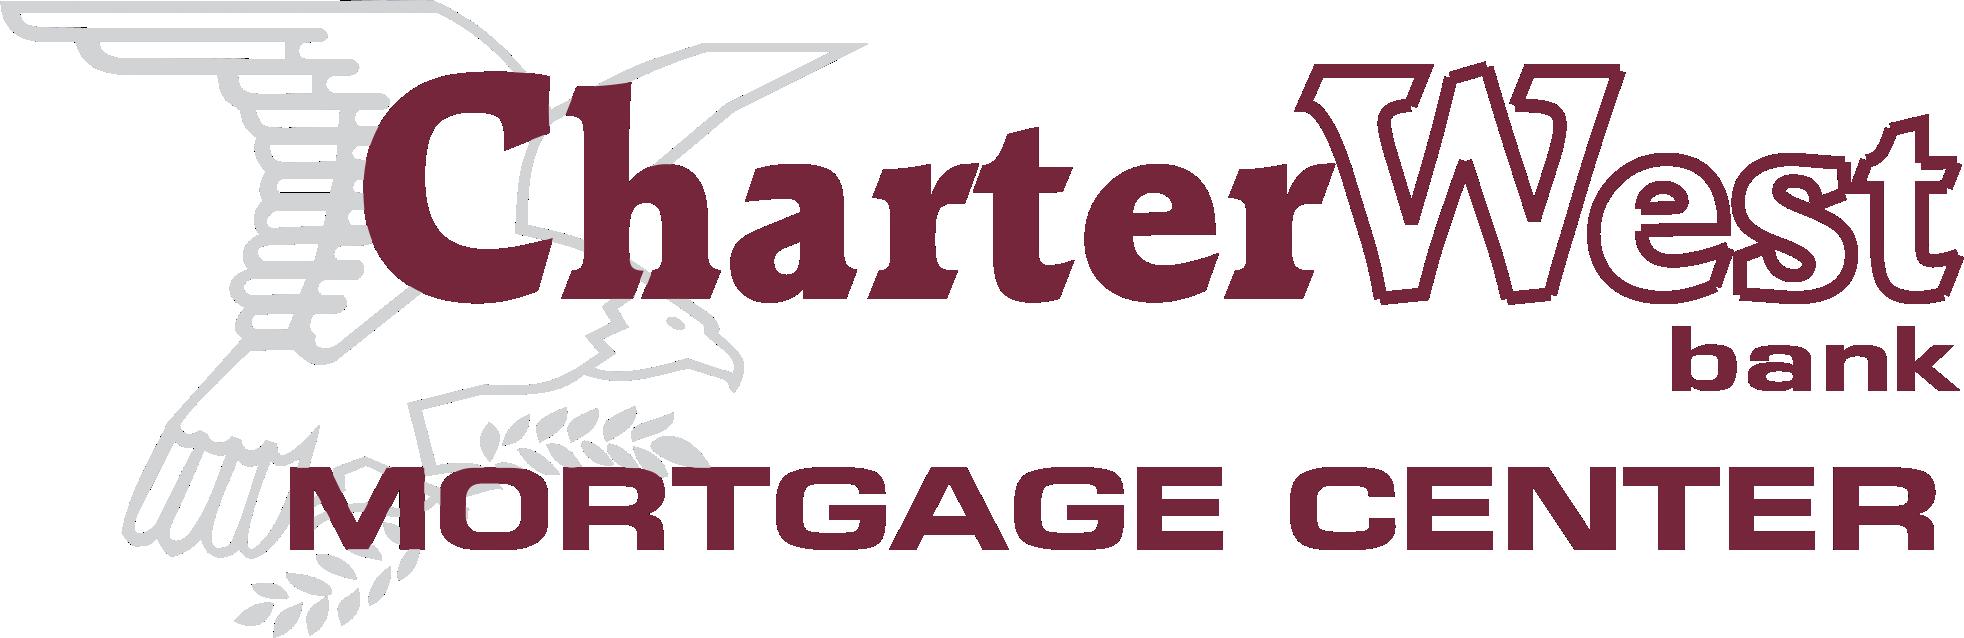 CWB MMortgage Logo Maroon .png